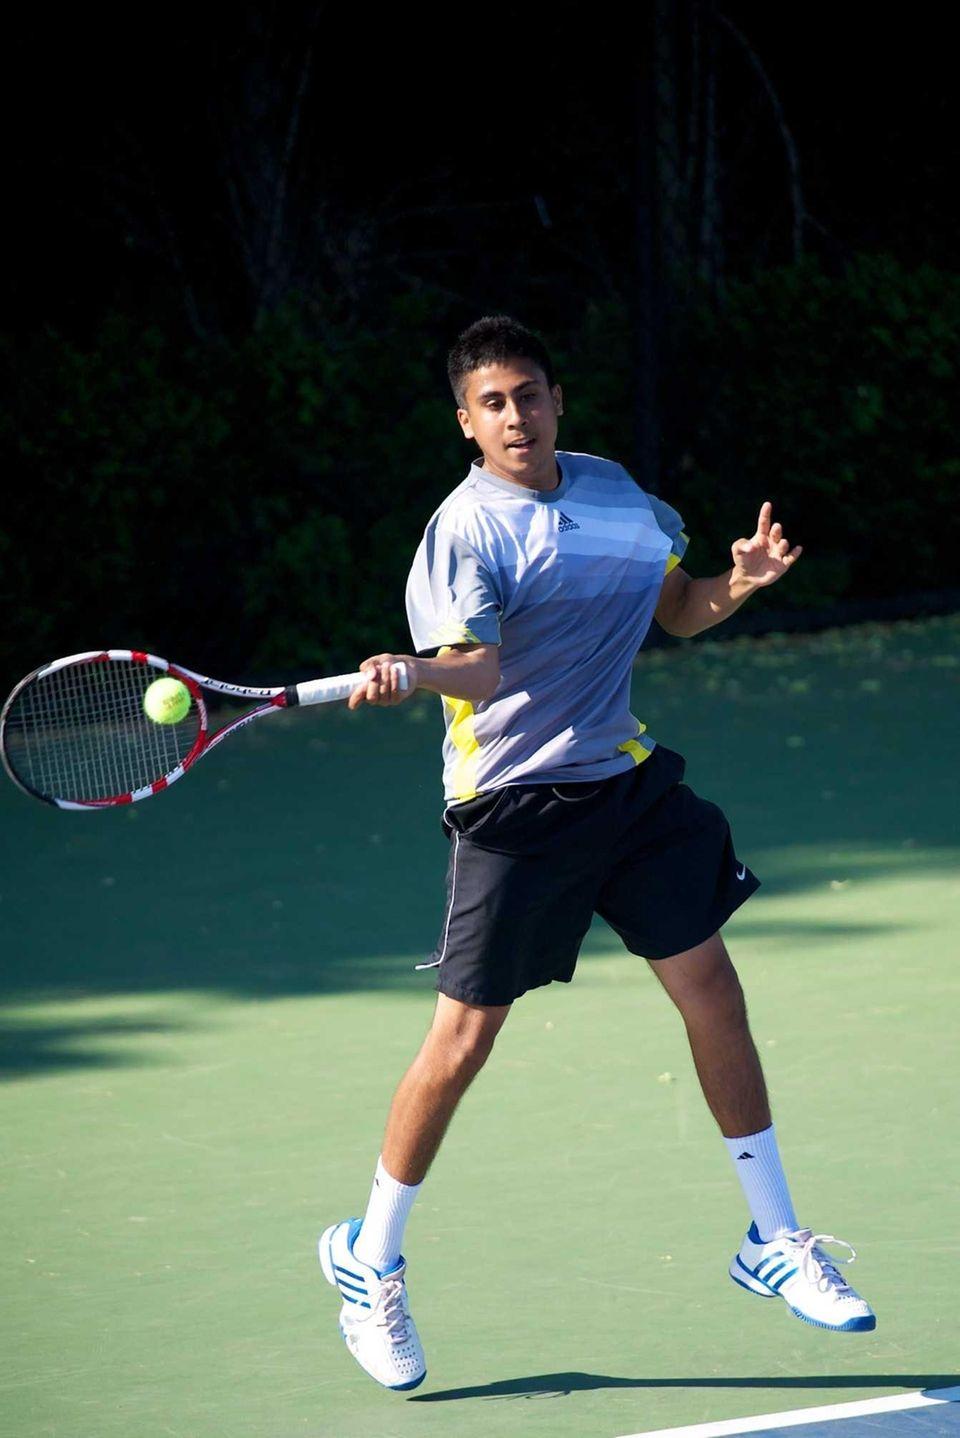 Zain Ali of Half Hollow Hills East hits